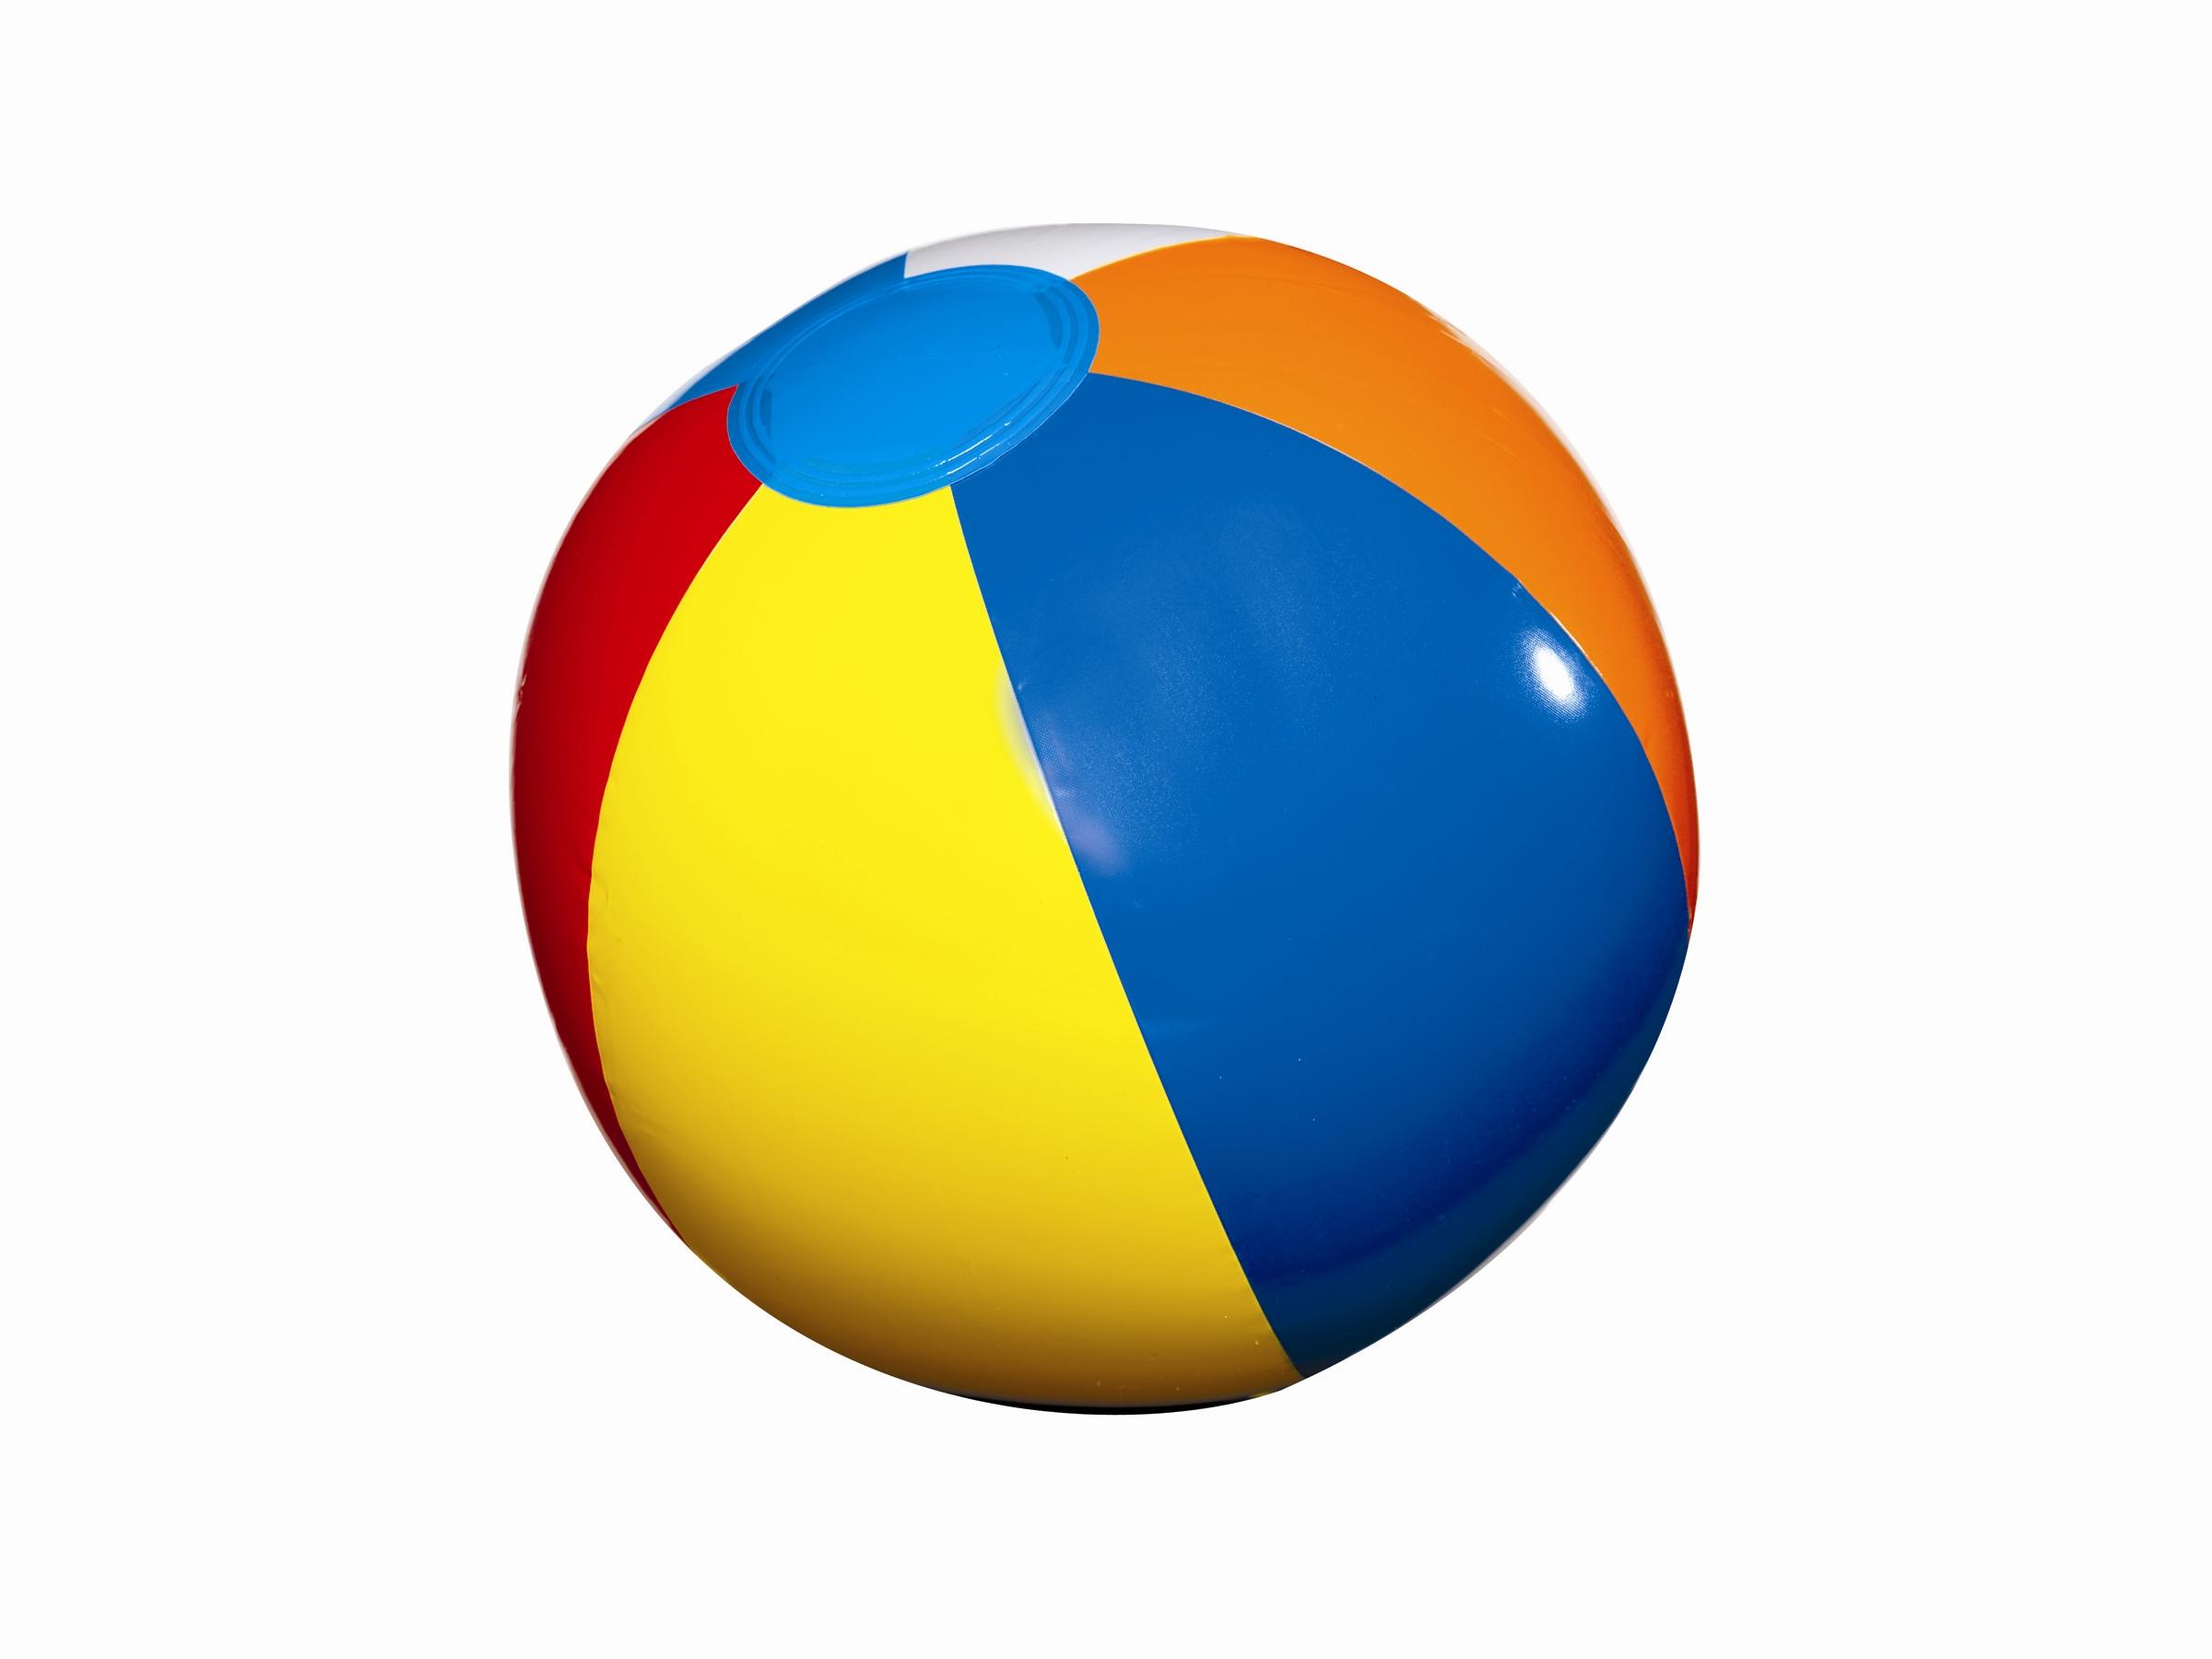 Free Beach Ball Clip Art, Download Free Clip Art, Free Clip.